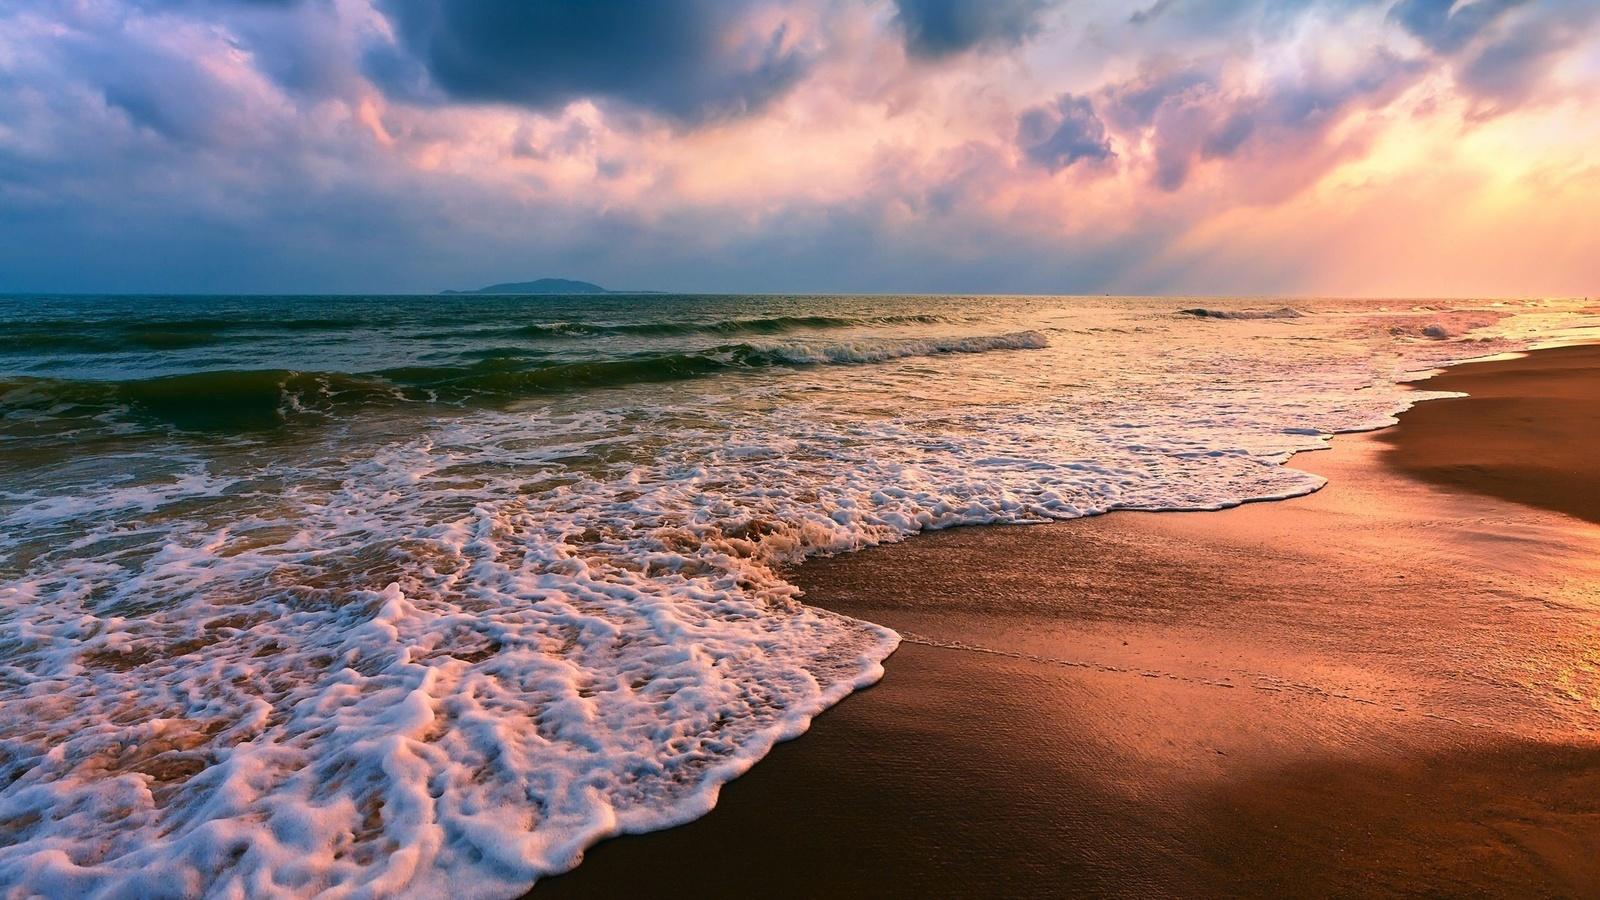 меркам таджикистана картинки моря на телефоне может